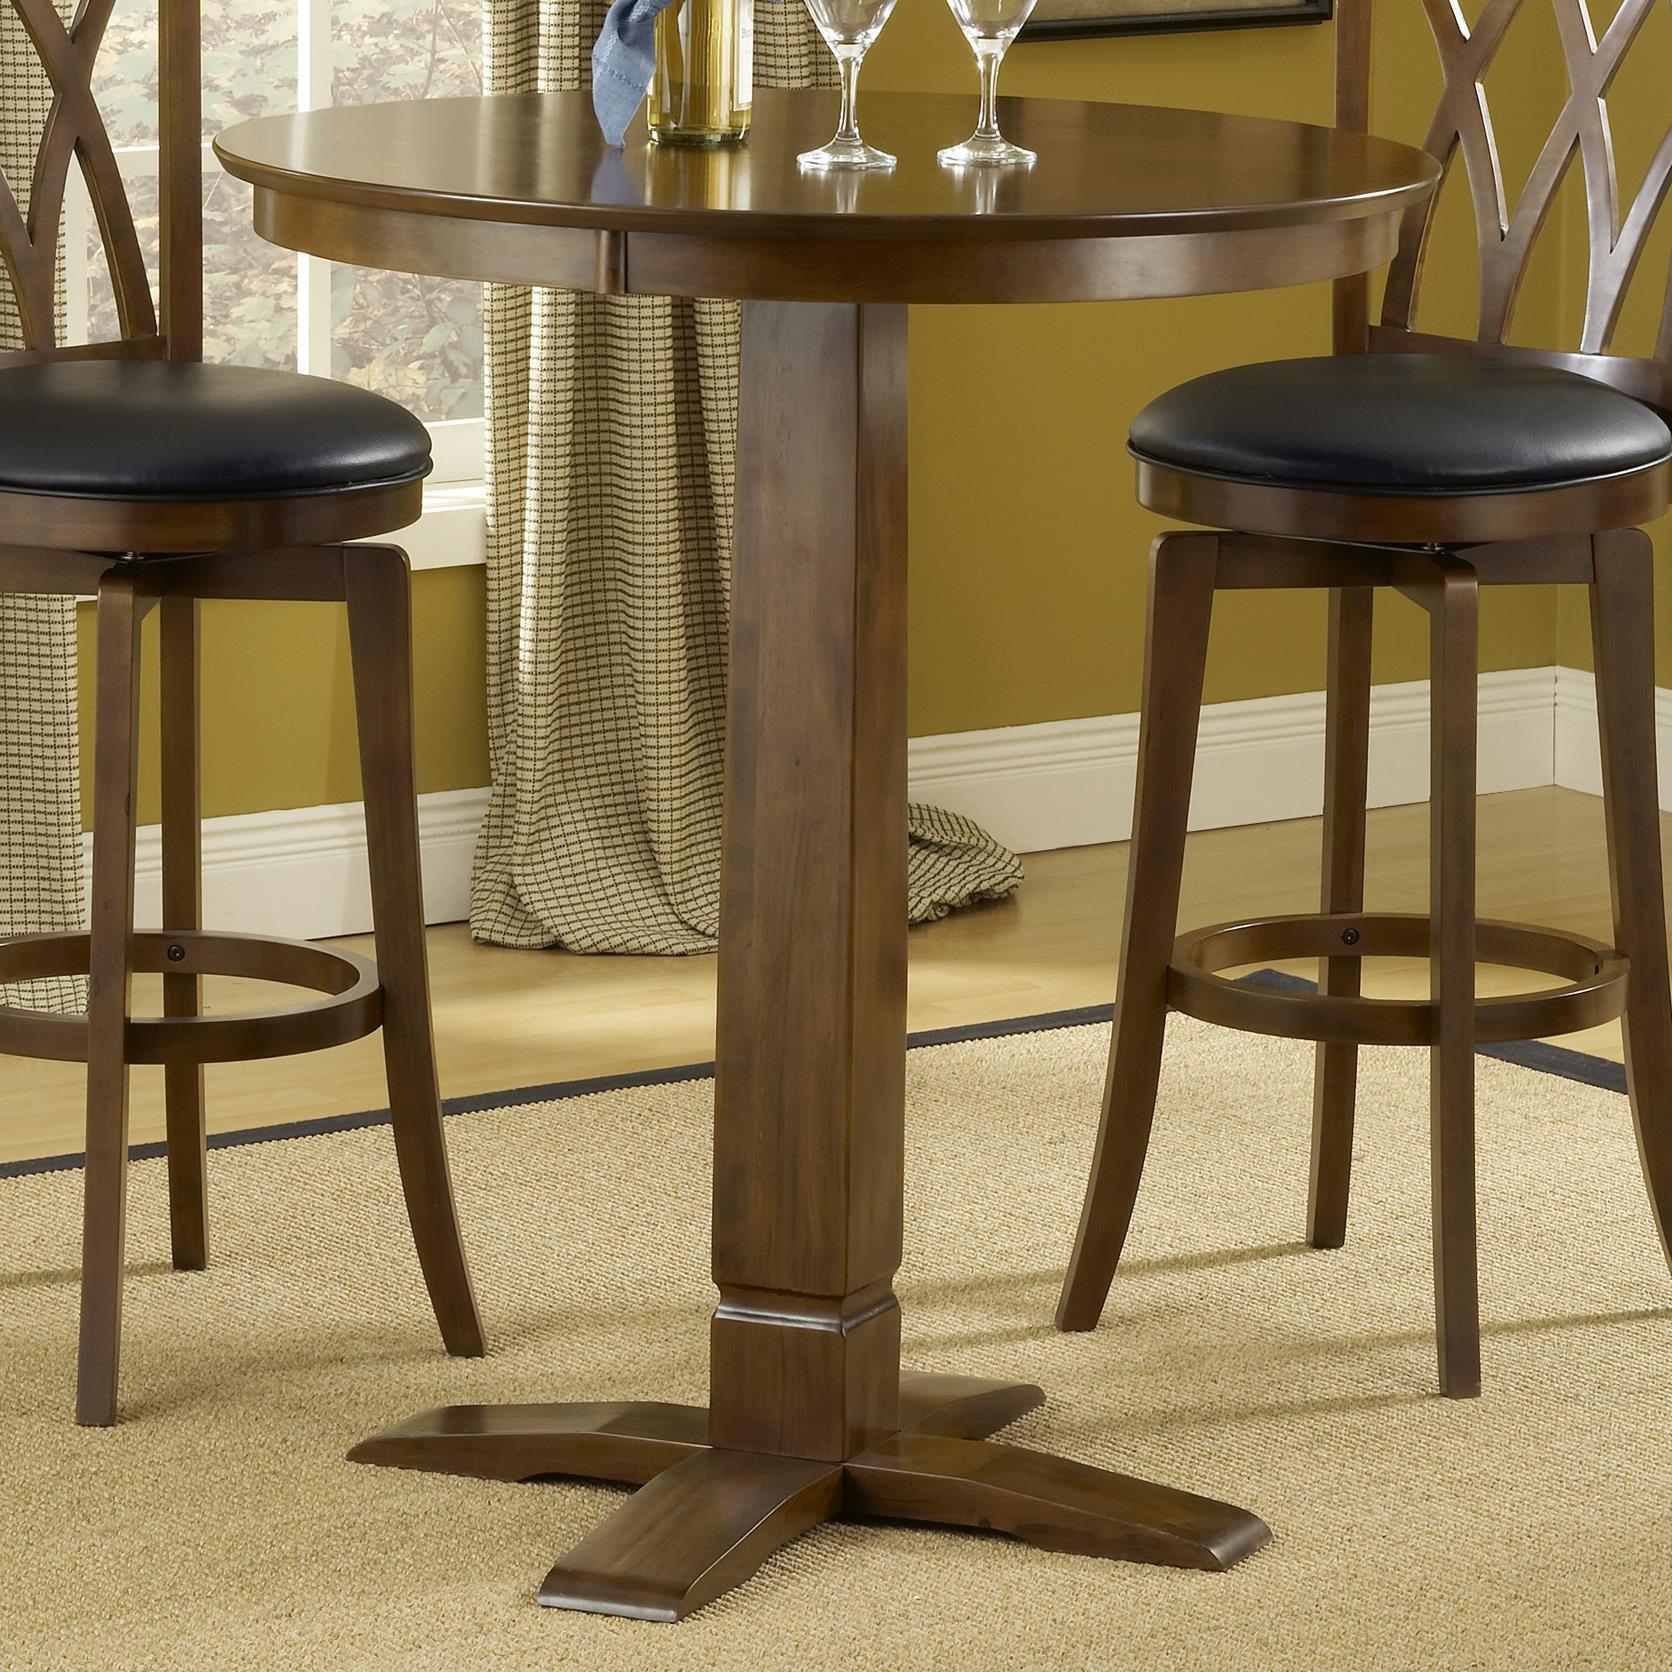 Dynamic Designs Bistro Table at Ruby Gordon Home